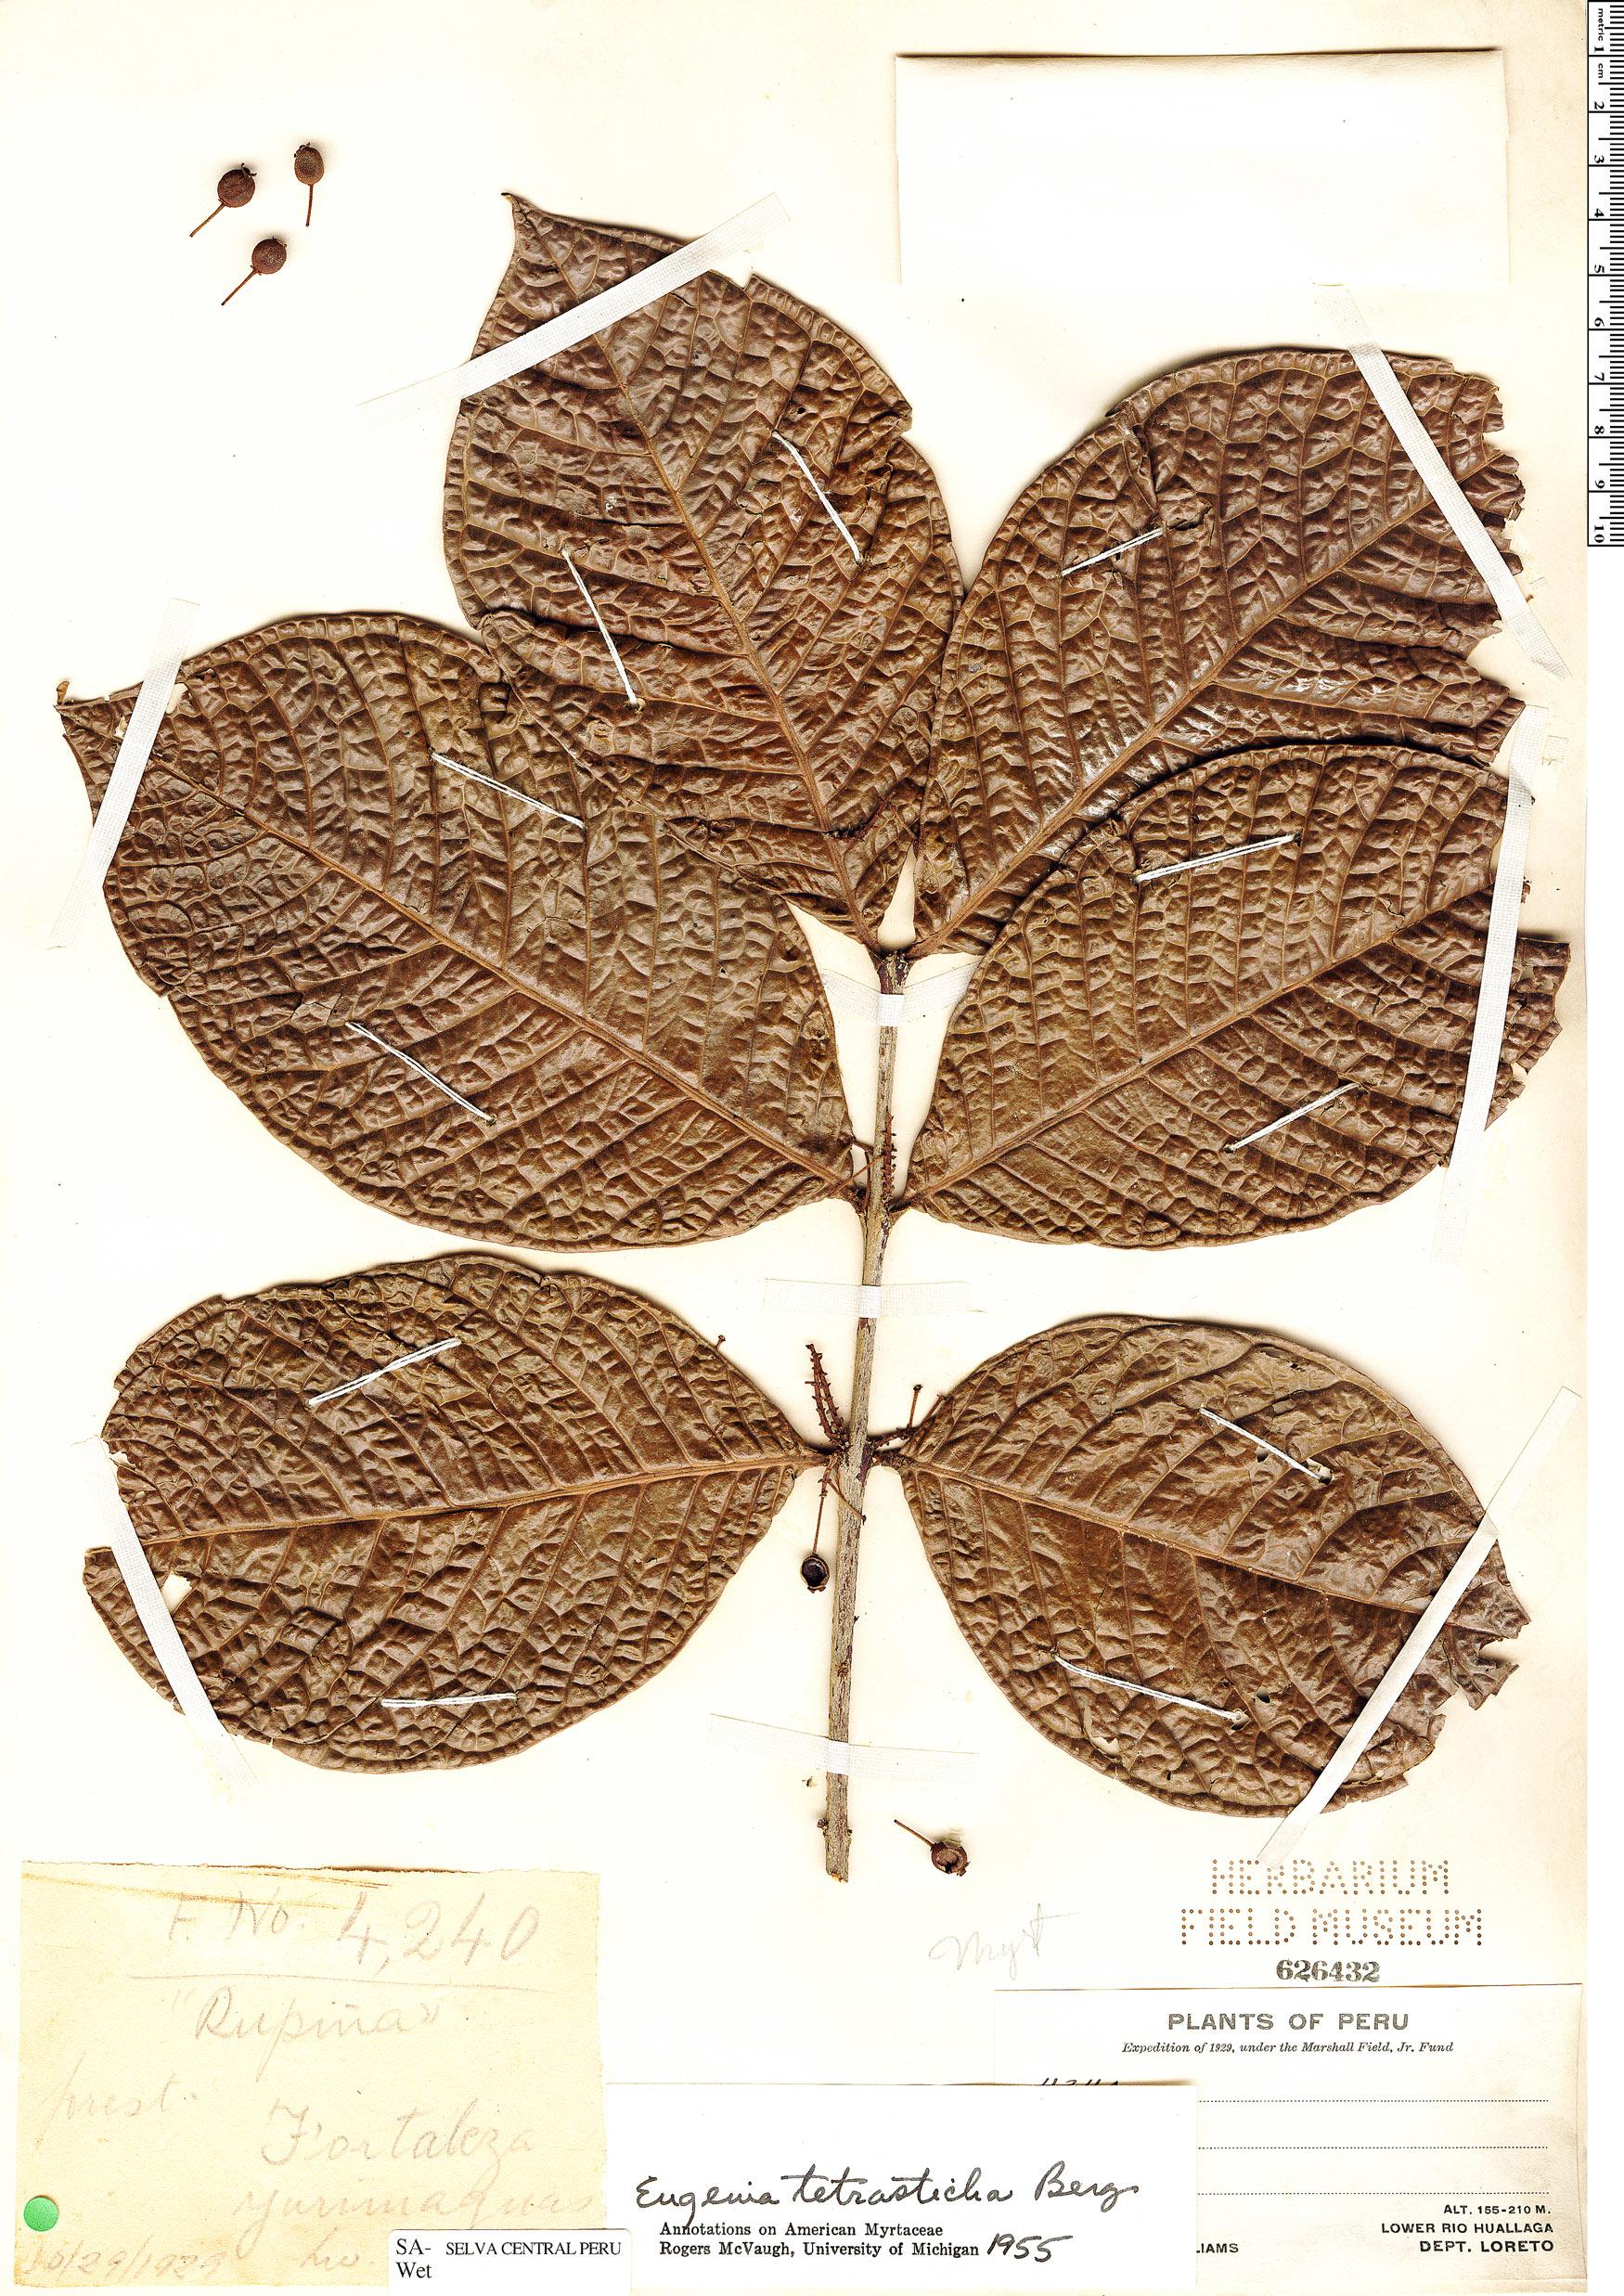 Specimen: Eugenia tetrasticha